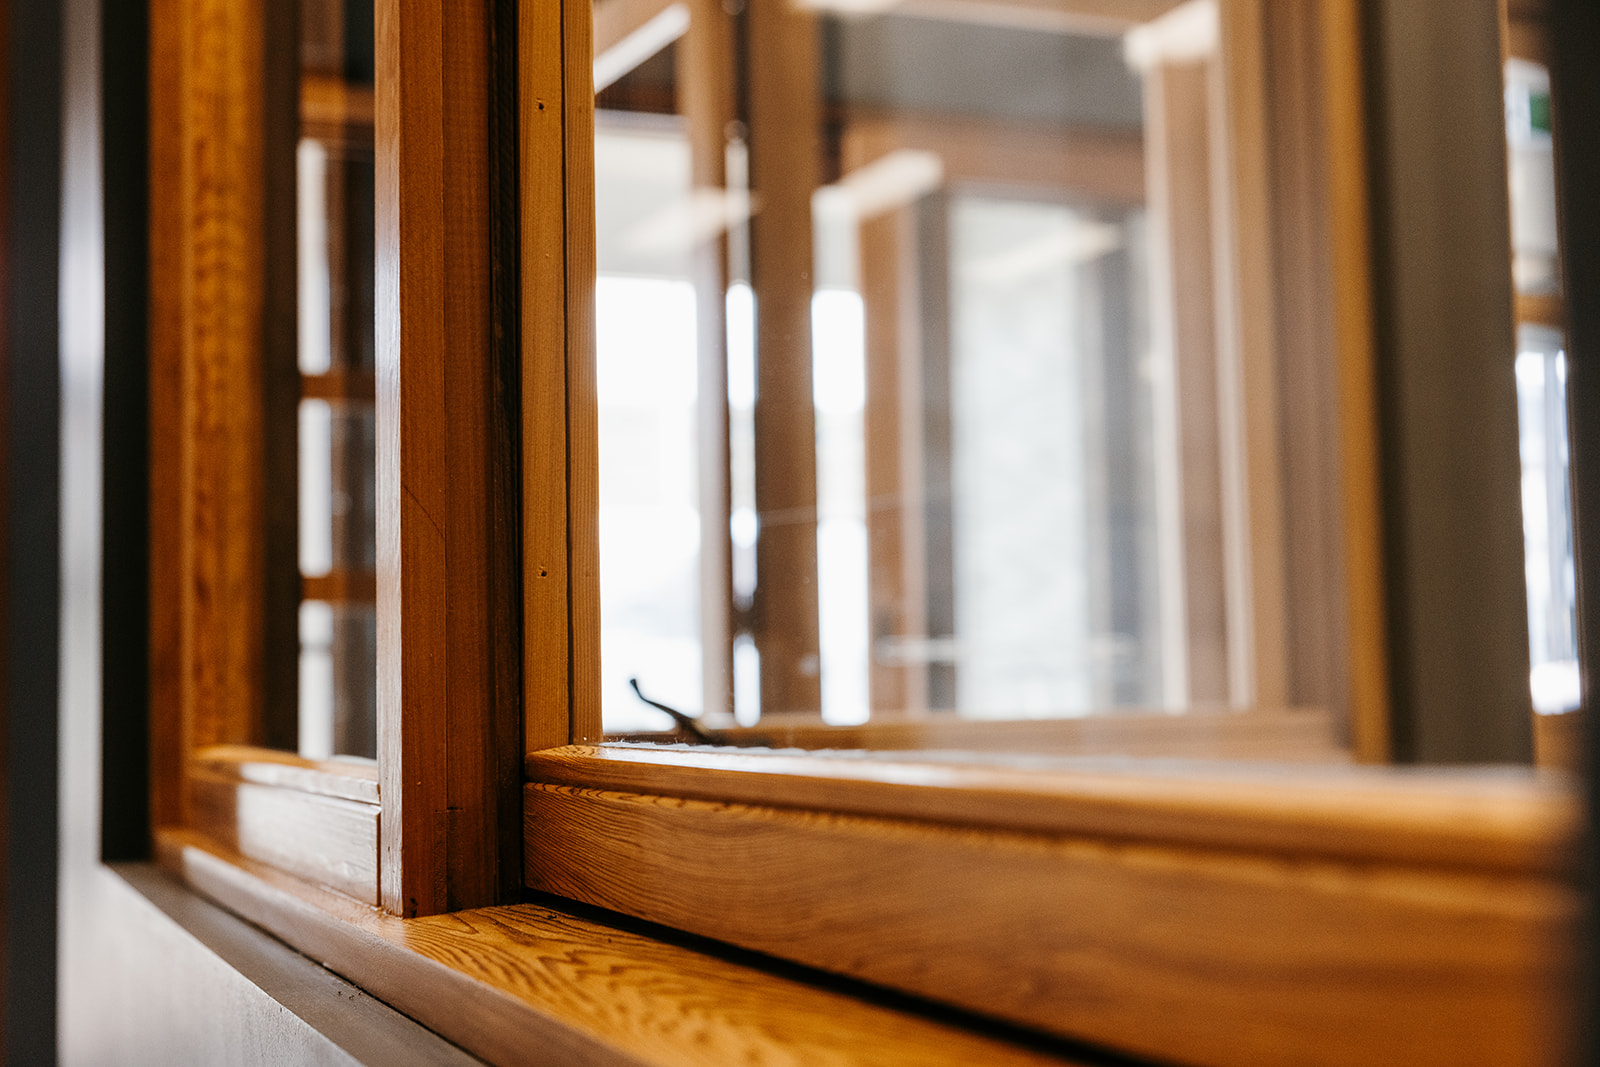 Stunning timber window sill close up